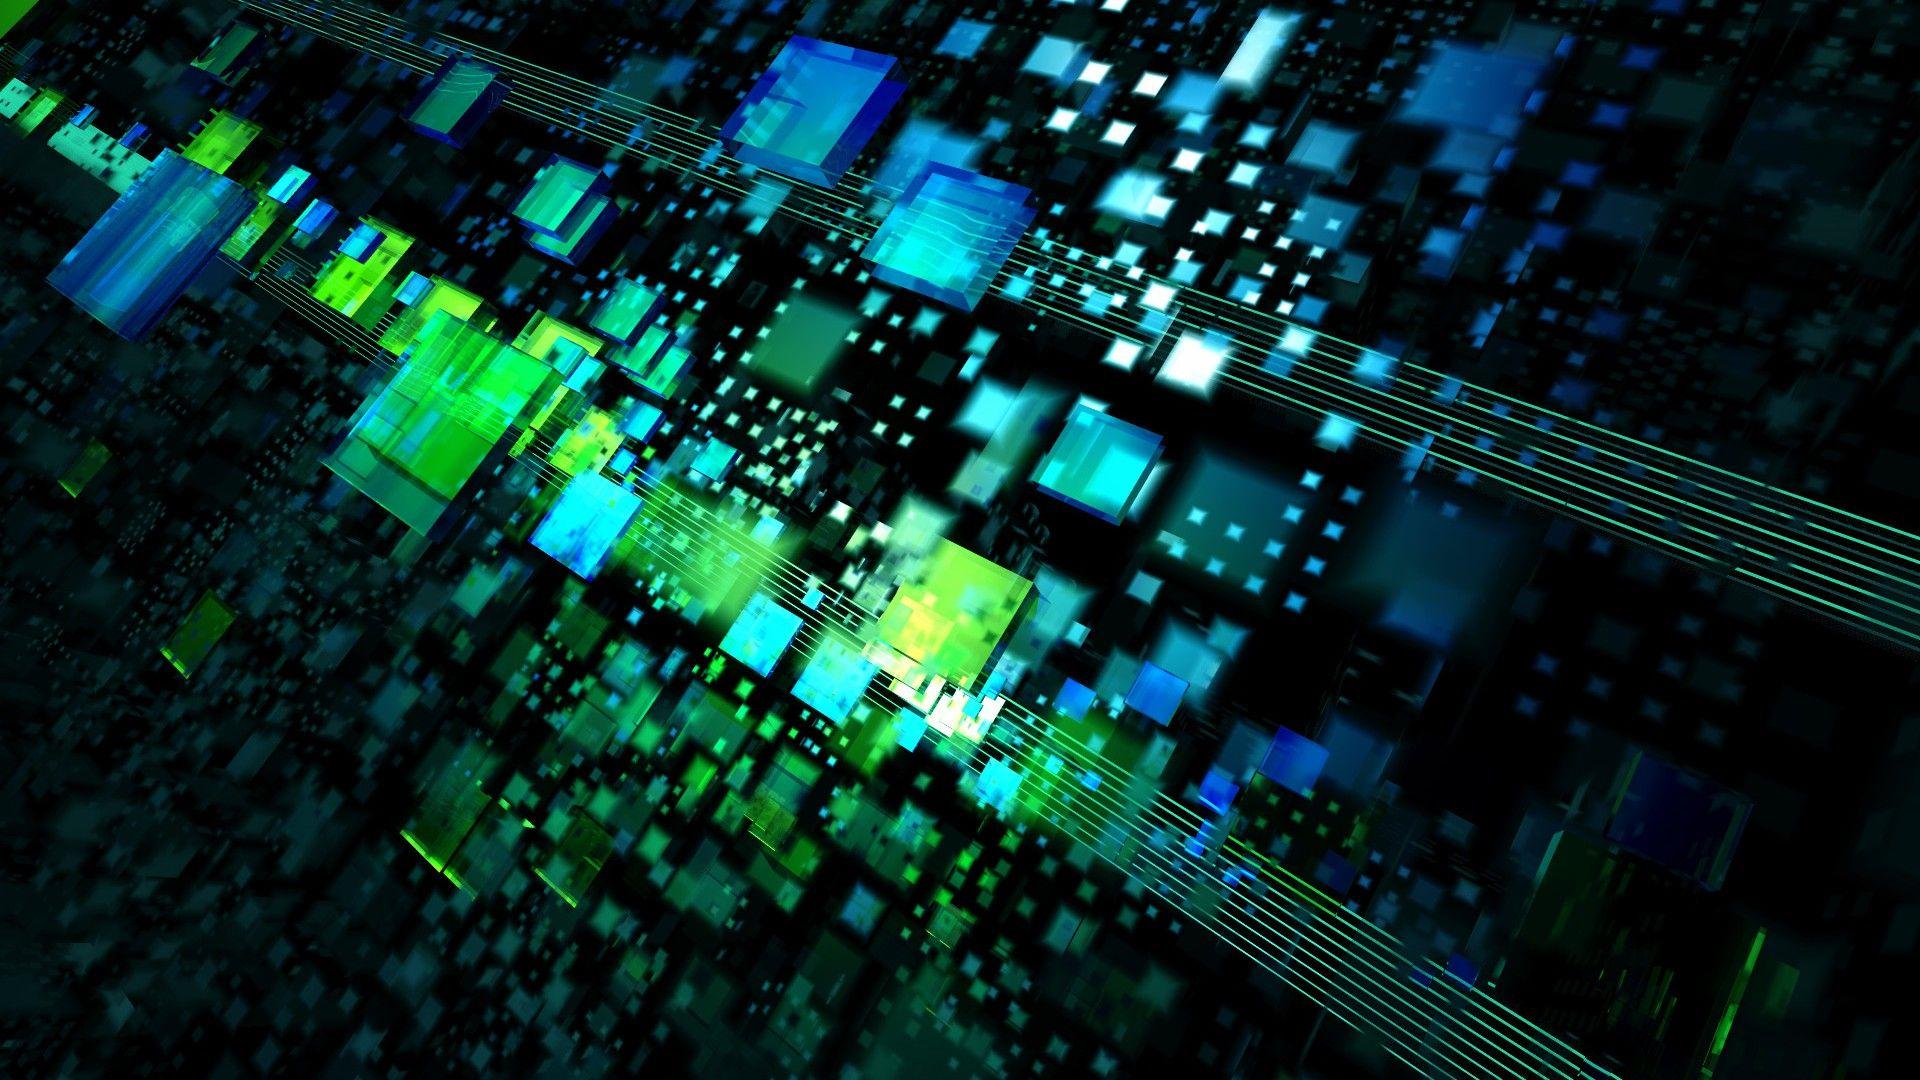 Hd wallpaper electronics - Computer Wallpapers Hd Group Desktop Wallpapers Hd